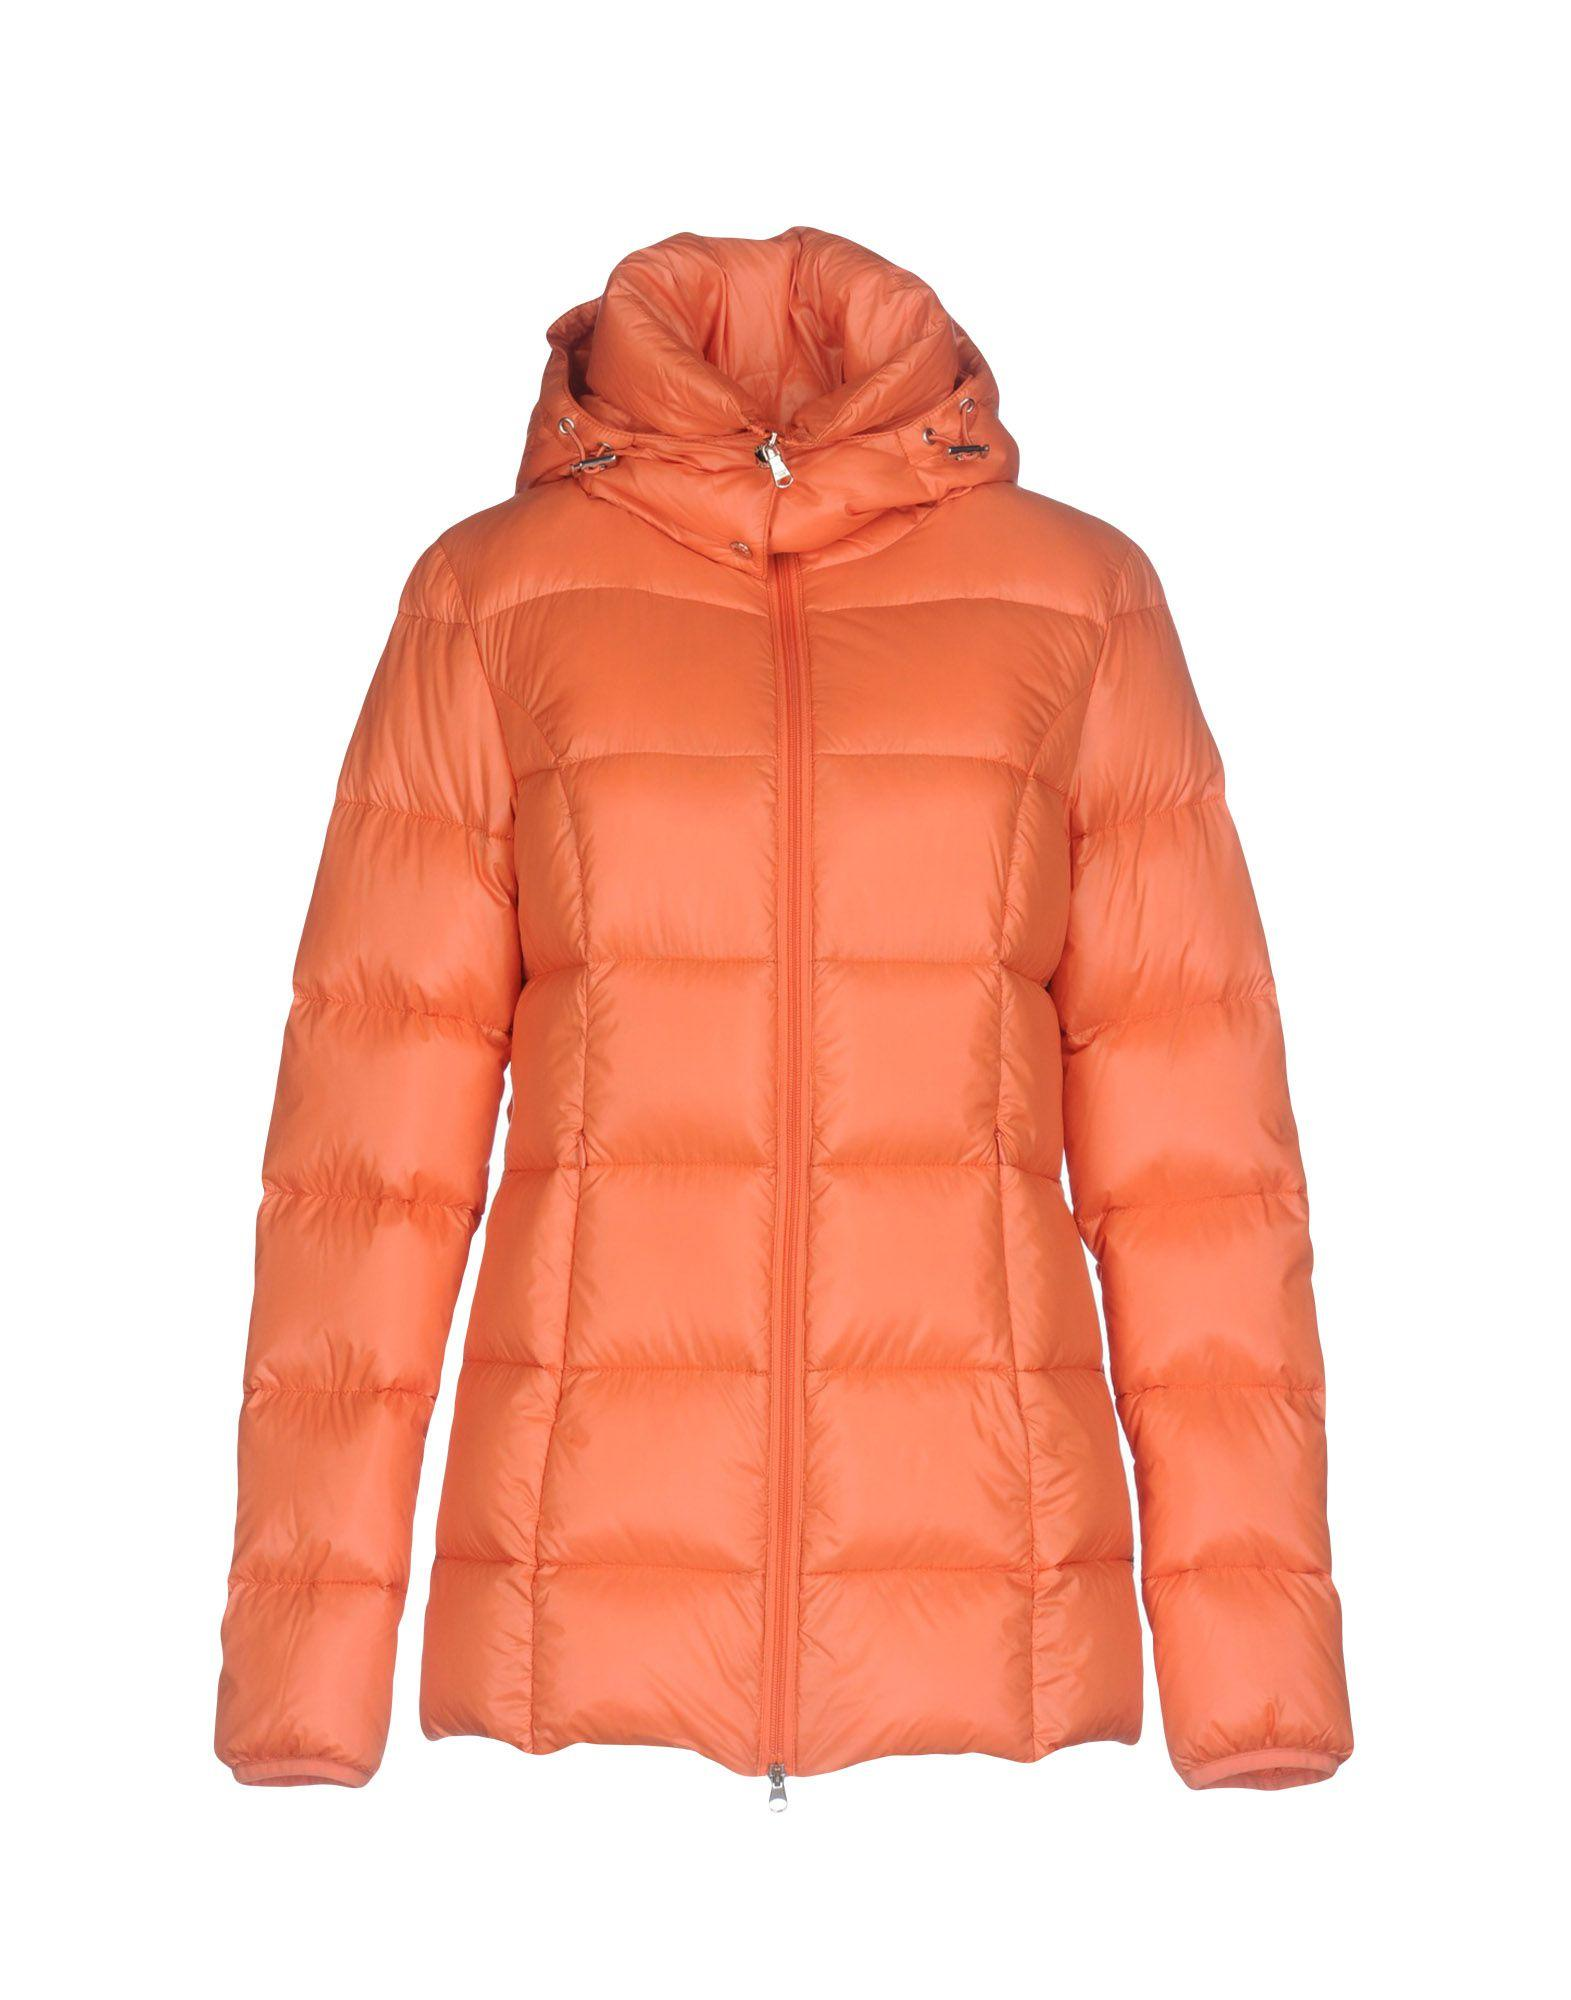 Patrizia Pepe Down Jackets In Orange